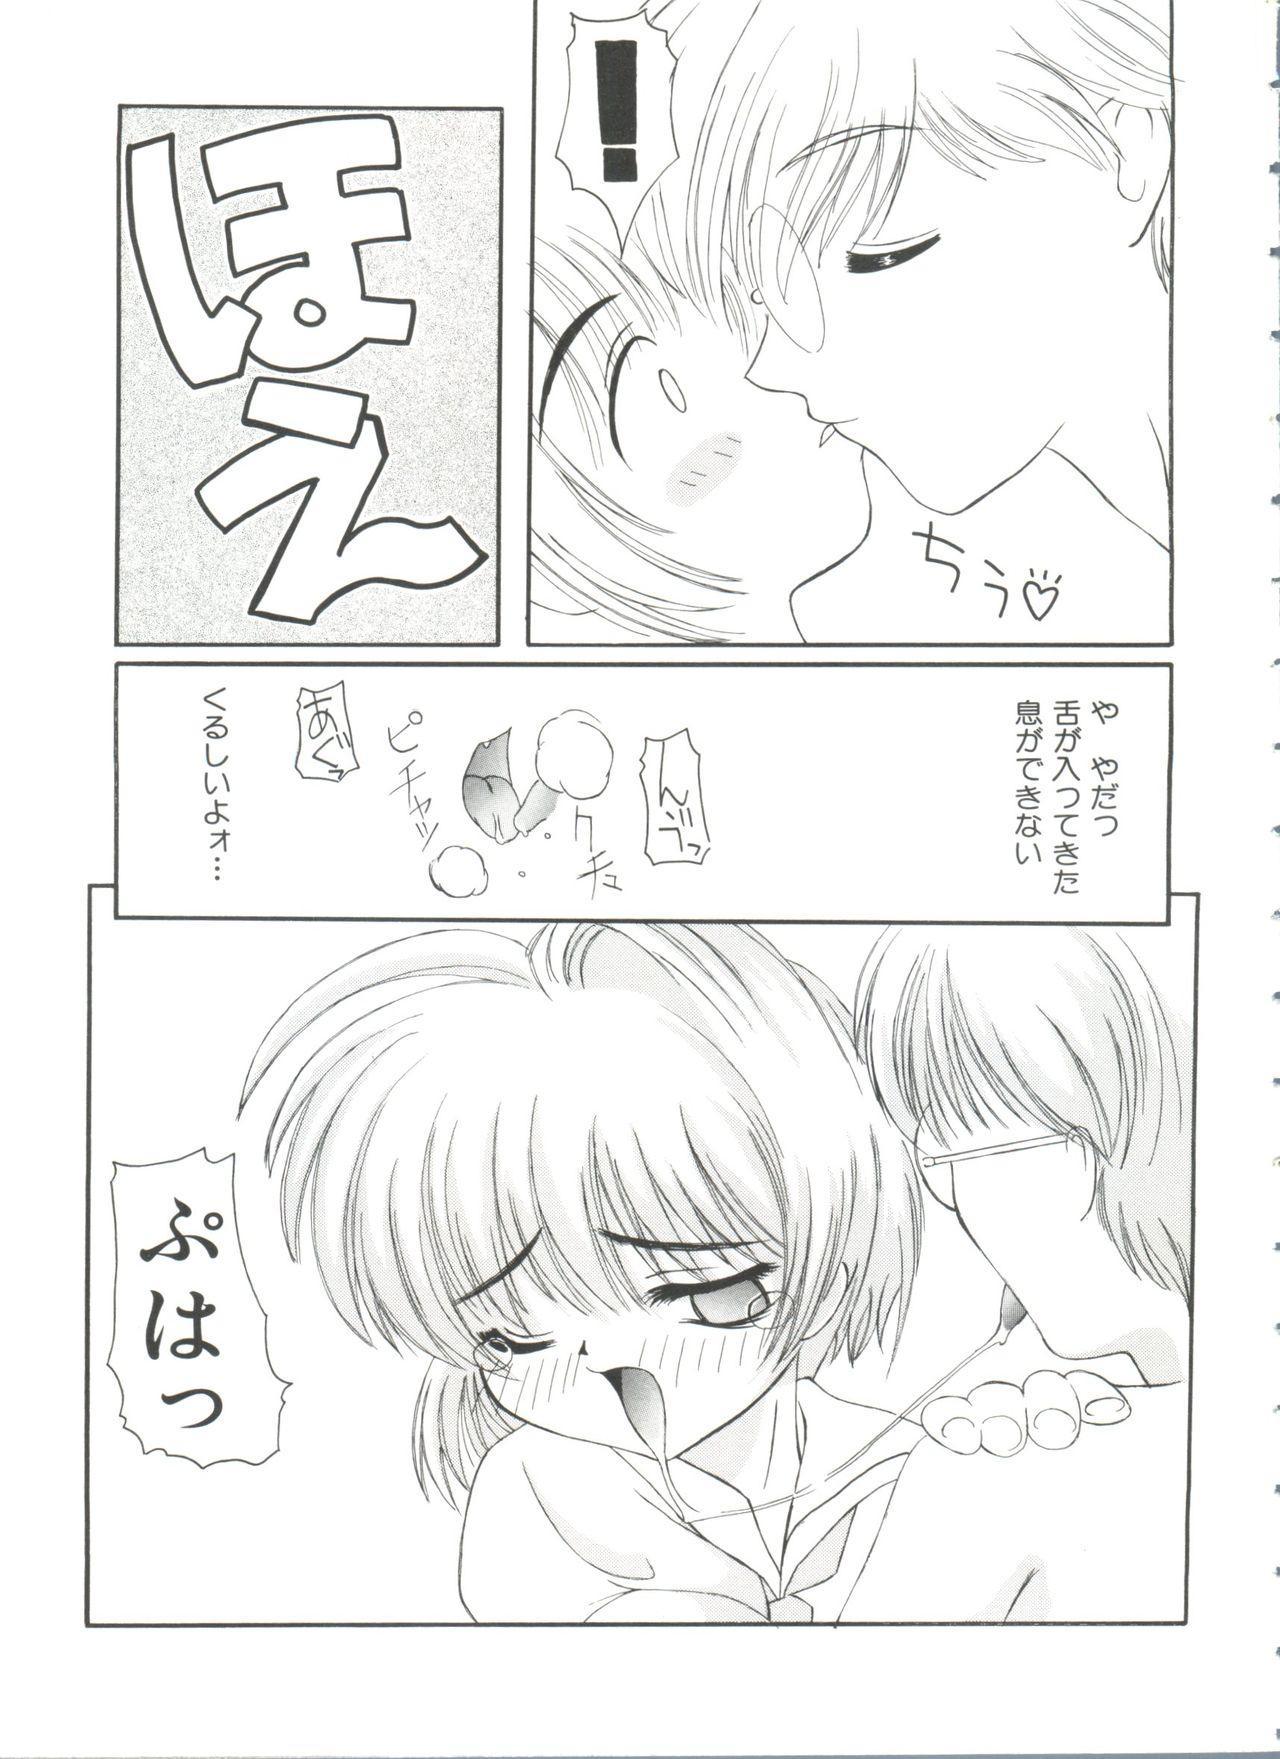 Ero-chan to Issho 100